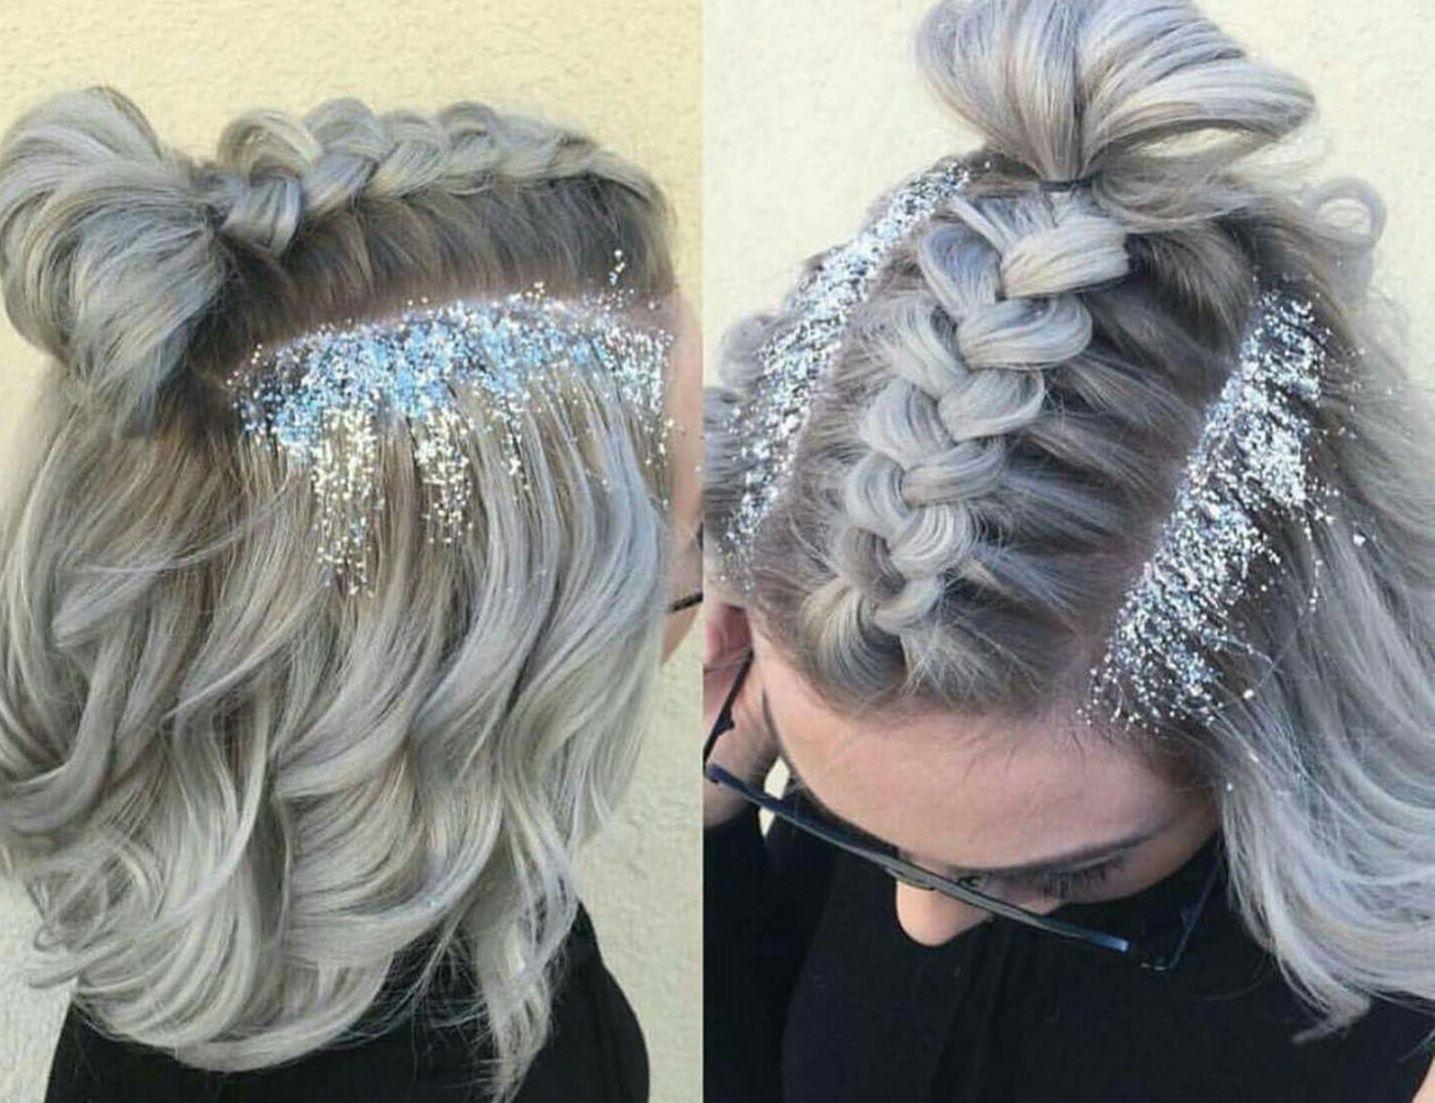 Hair Ideas For Short Hair Pinterest: Pin By Tyler Hernandez On Hair